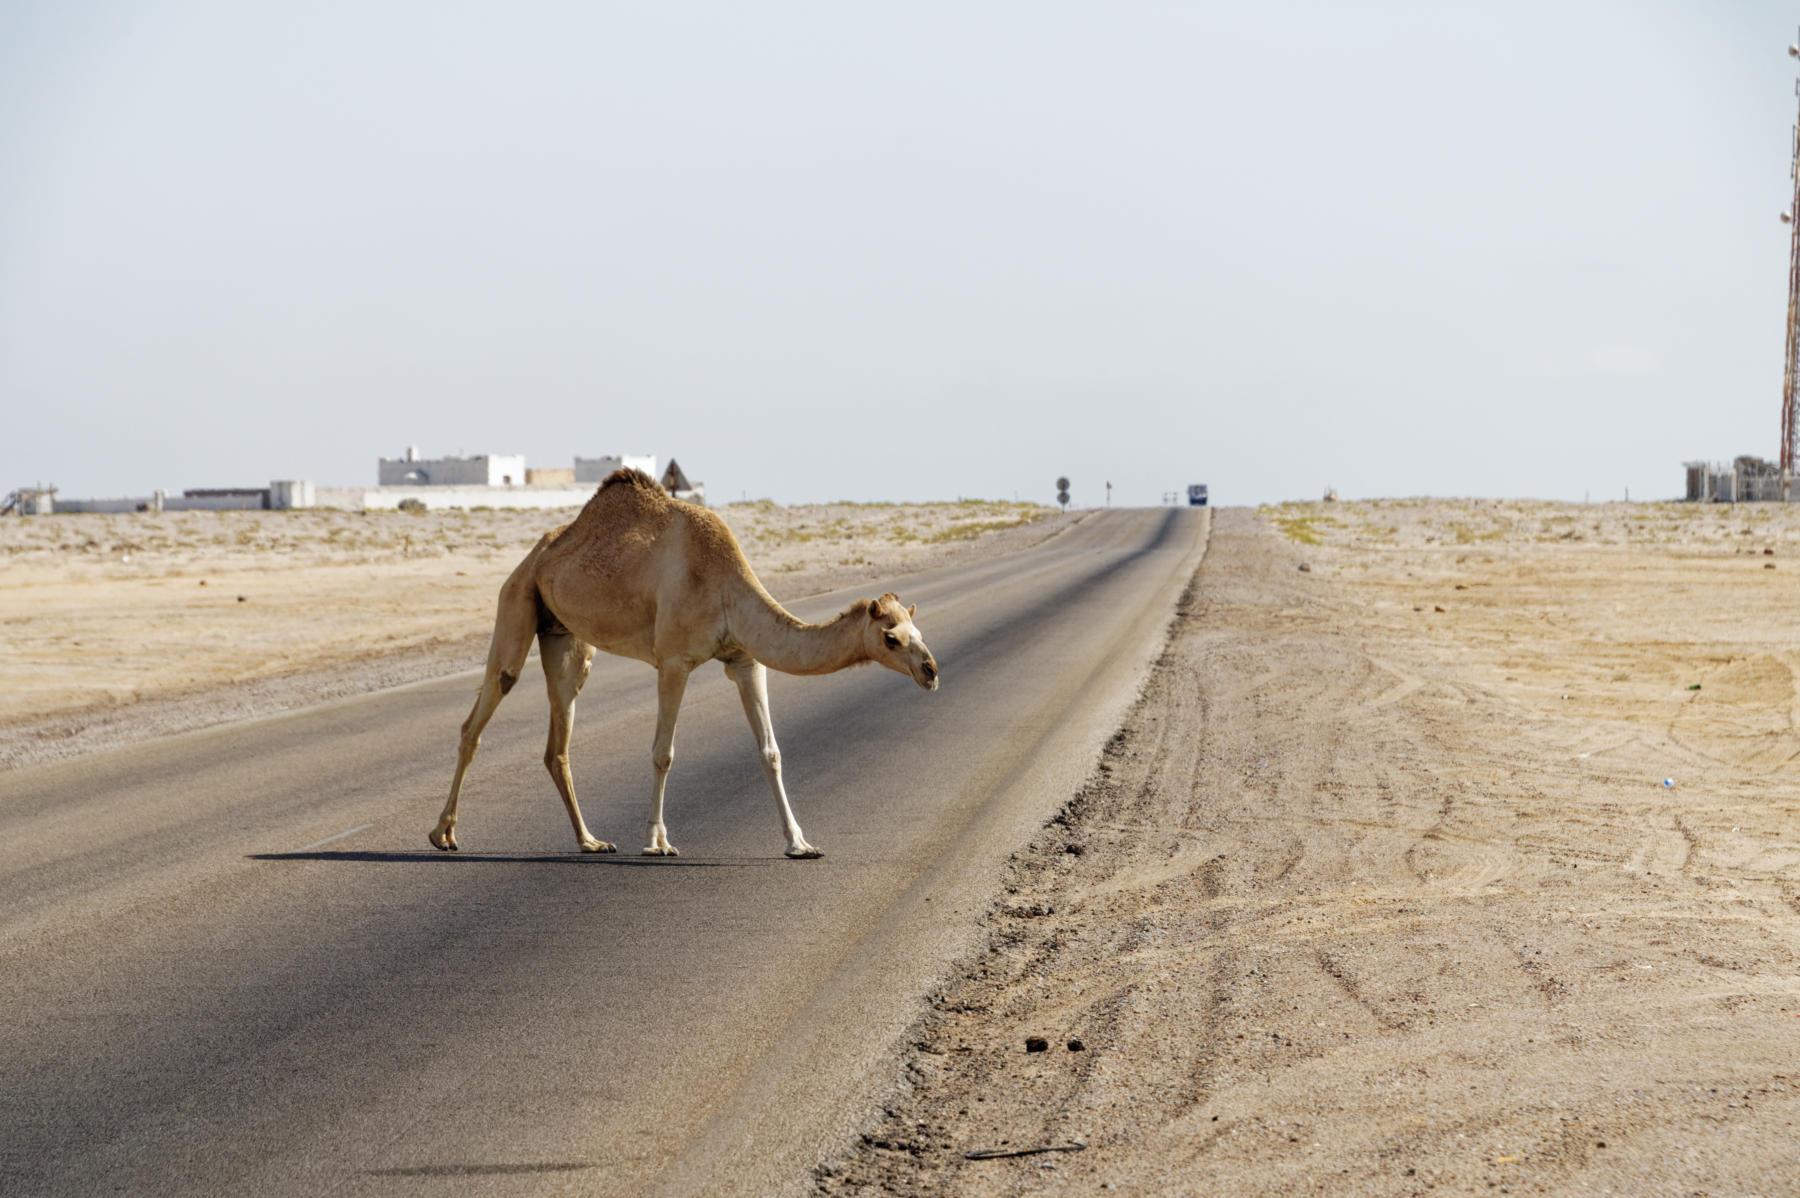 A fairly standard Oman road hazard